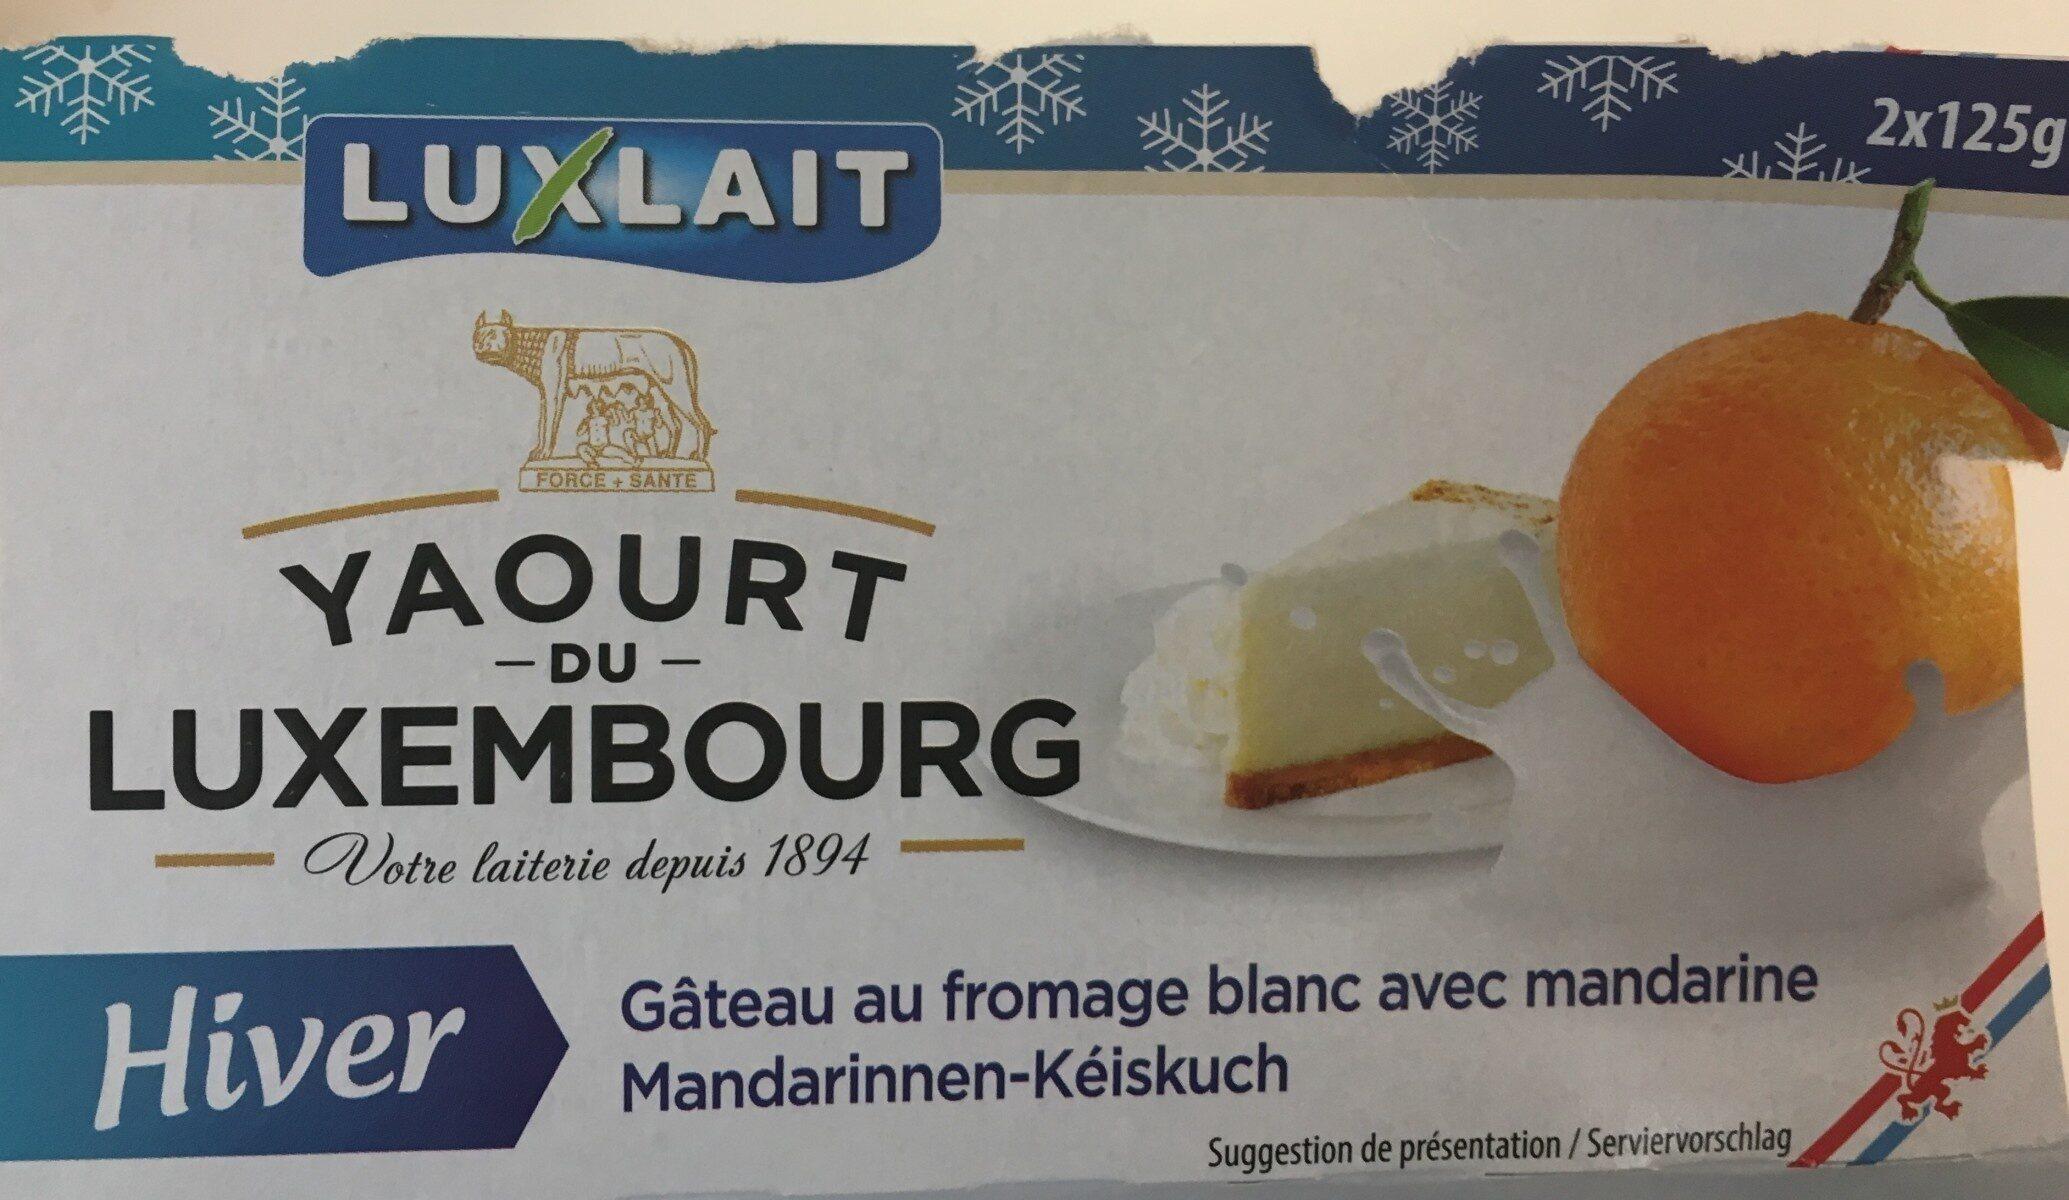 Yaourt du Luxembourg Fromage blanc avec mandarine - Prodotto - fr